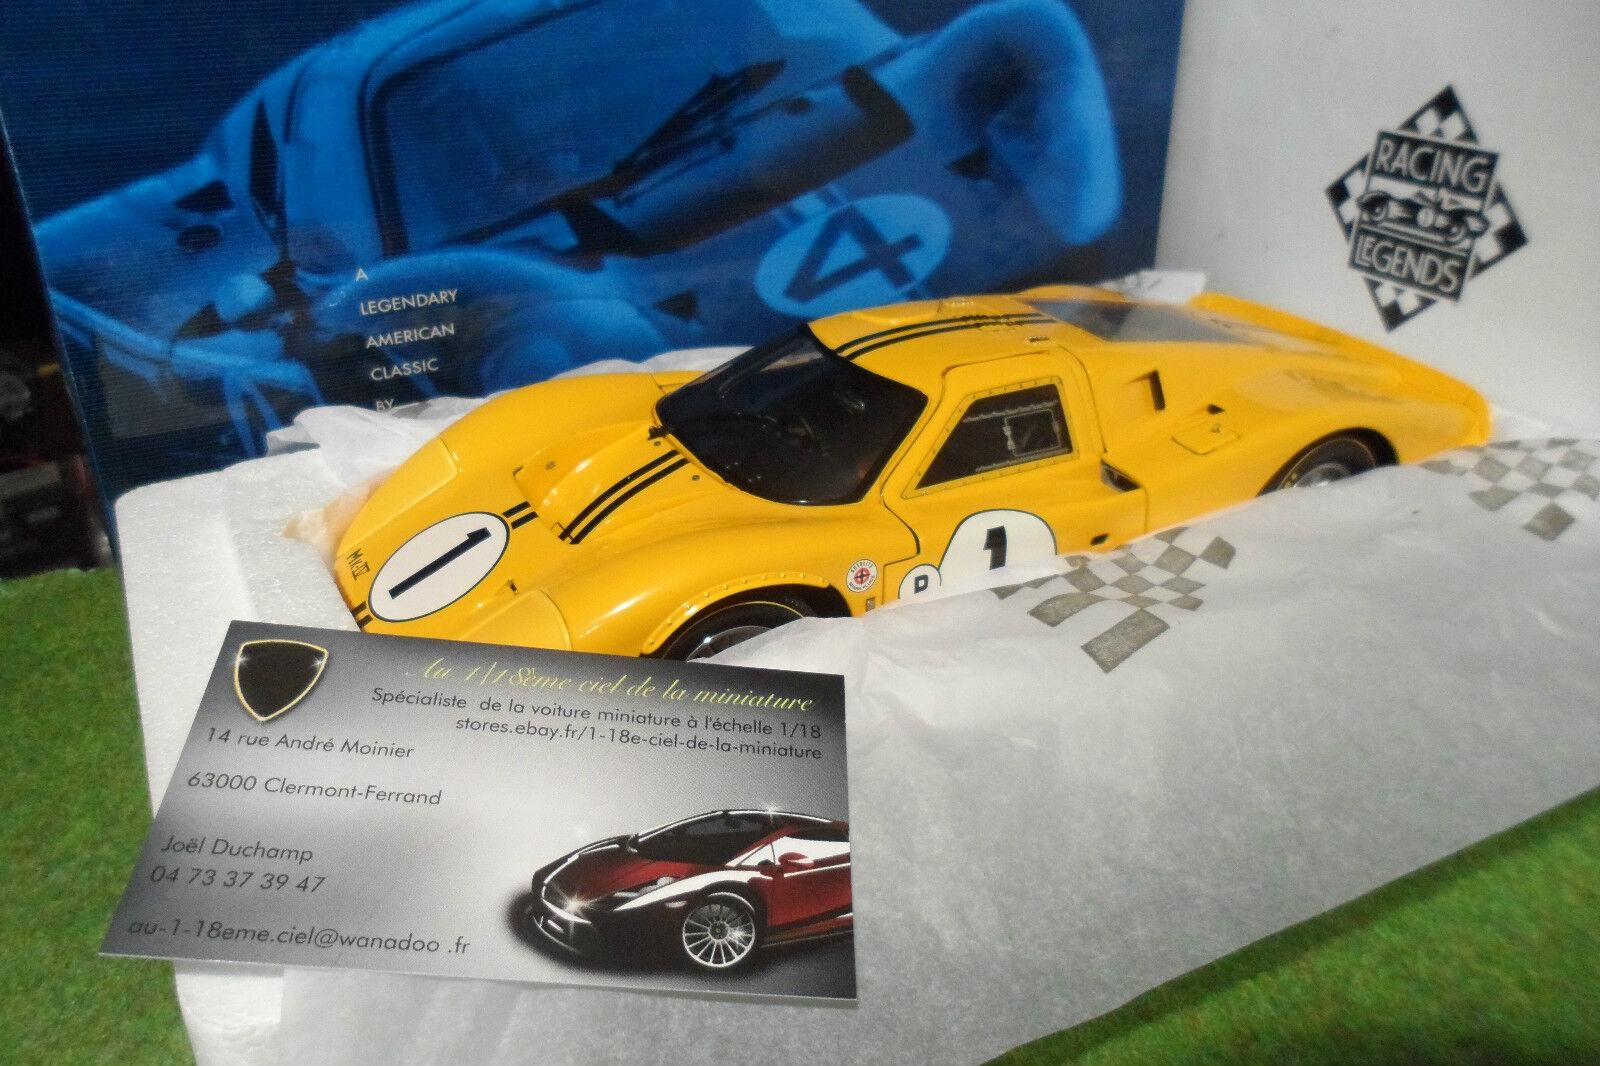 barato y de alta calidad FORD GT40 MK IV  1 Winner Winner Winner SEBRING 1967 au 1 18 EXOTO RLG 18051 voiture miniature  tienda en linea